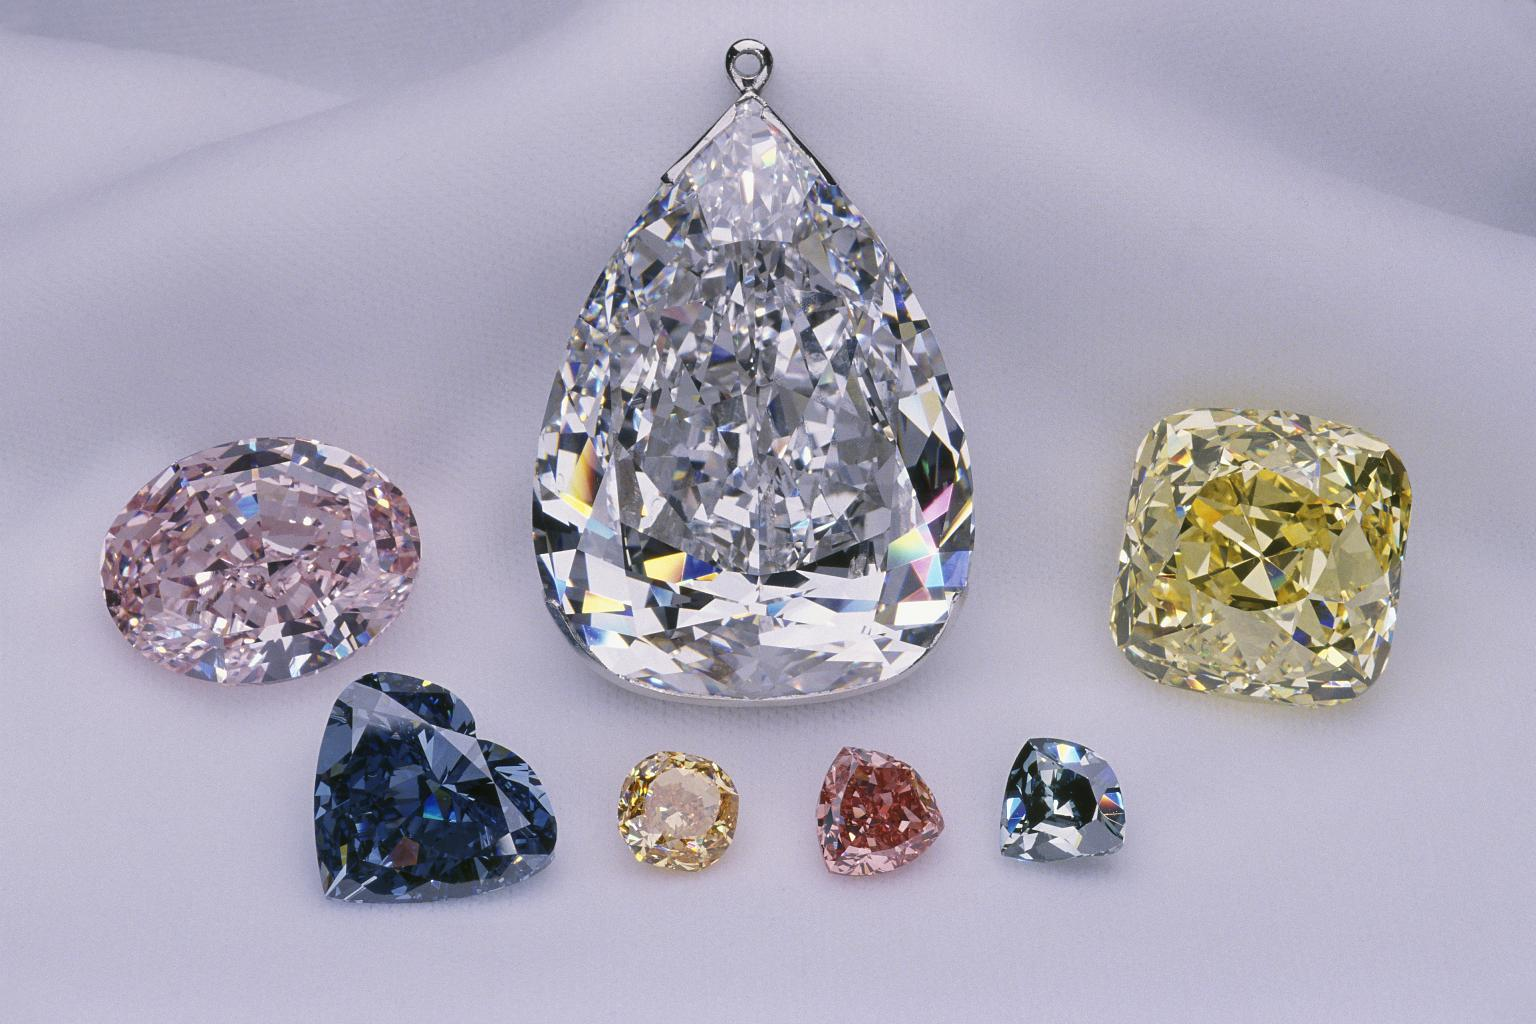 картинки бриллиантов на прозрачном фоне